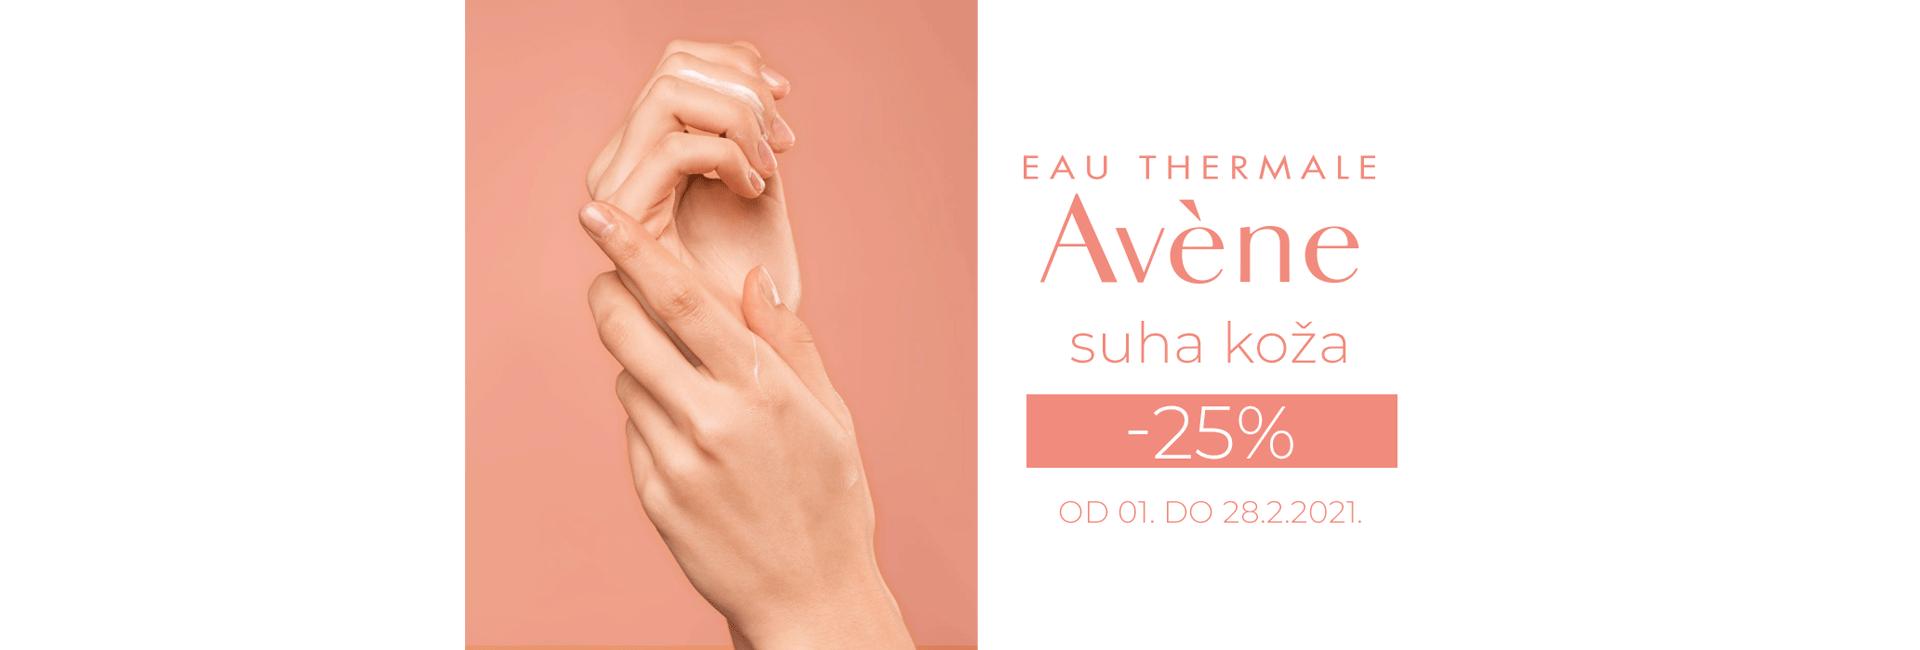 Avene -25% suha koža